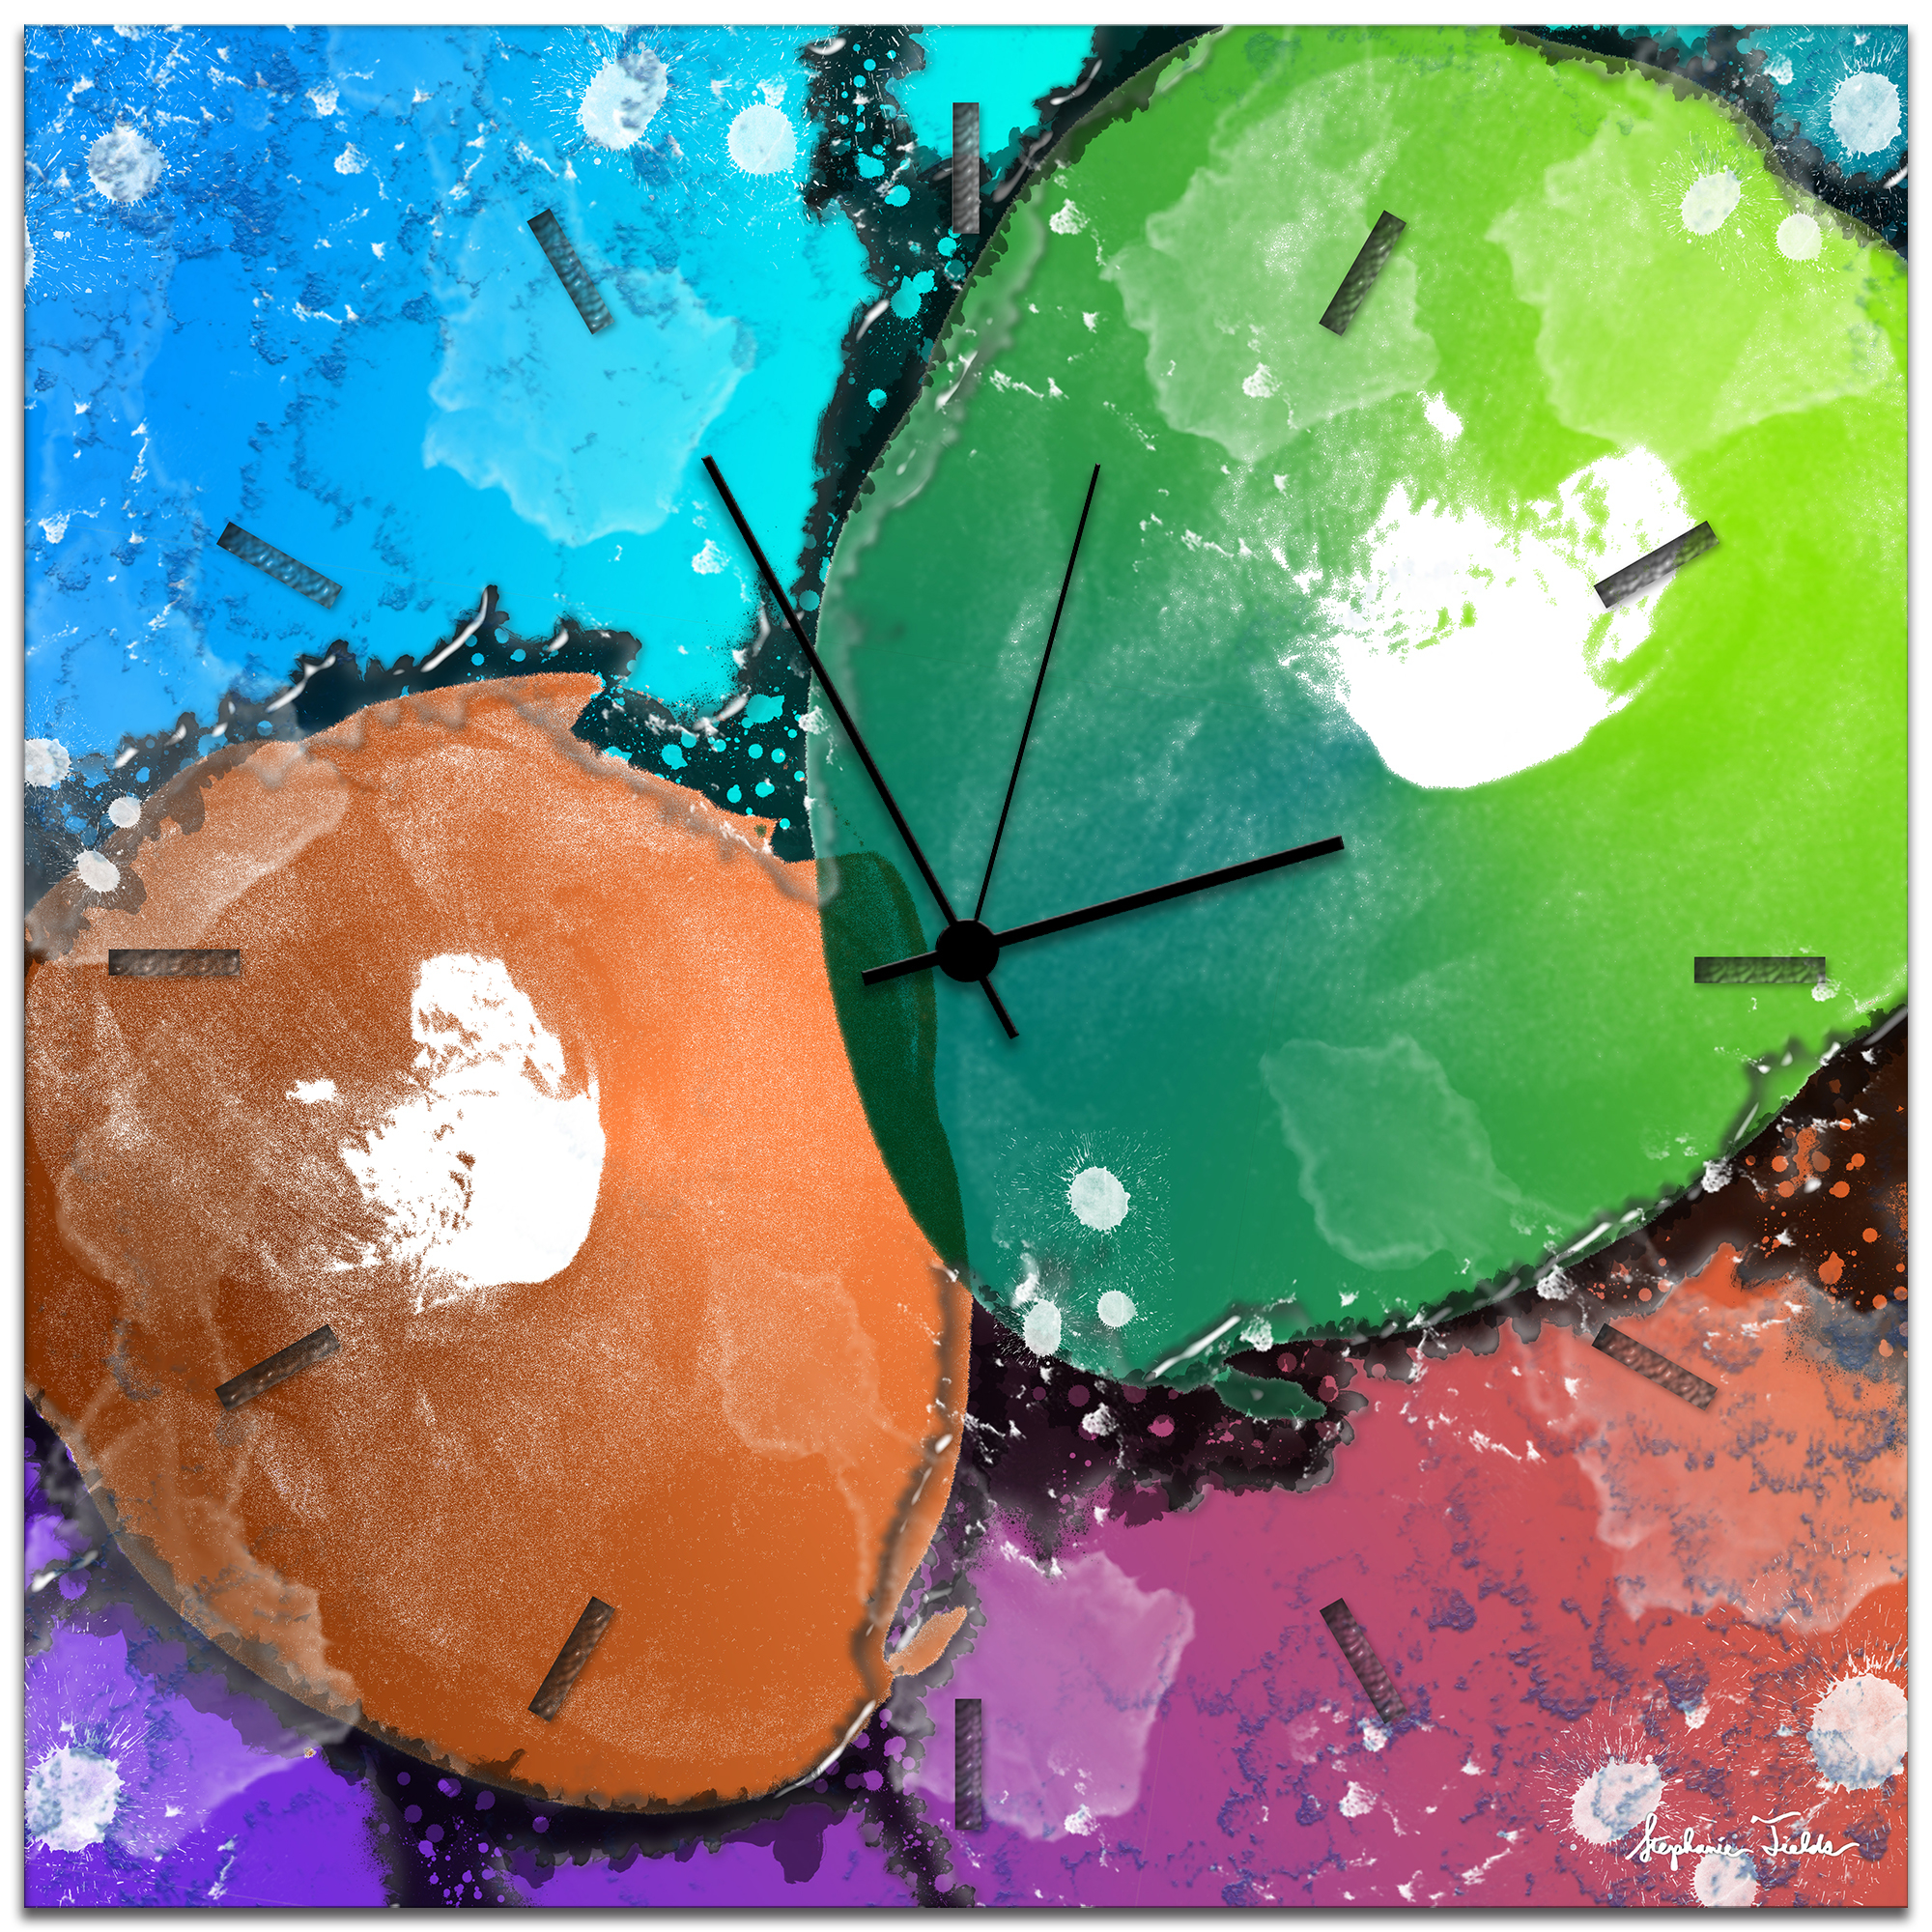 Rainbow Color Clock 'Quantum Clock' - 22x22 in. - Metallic Funky Wall Clock - Neon Colored Clock - Abstract Metal Clock 51f767f41c0ba0ff30000741